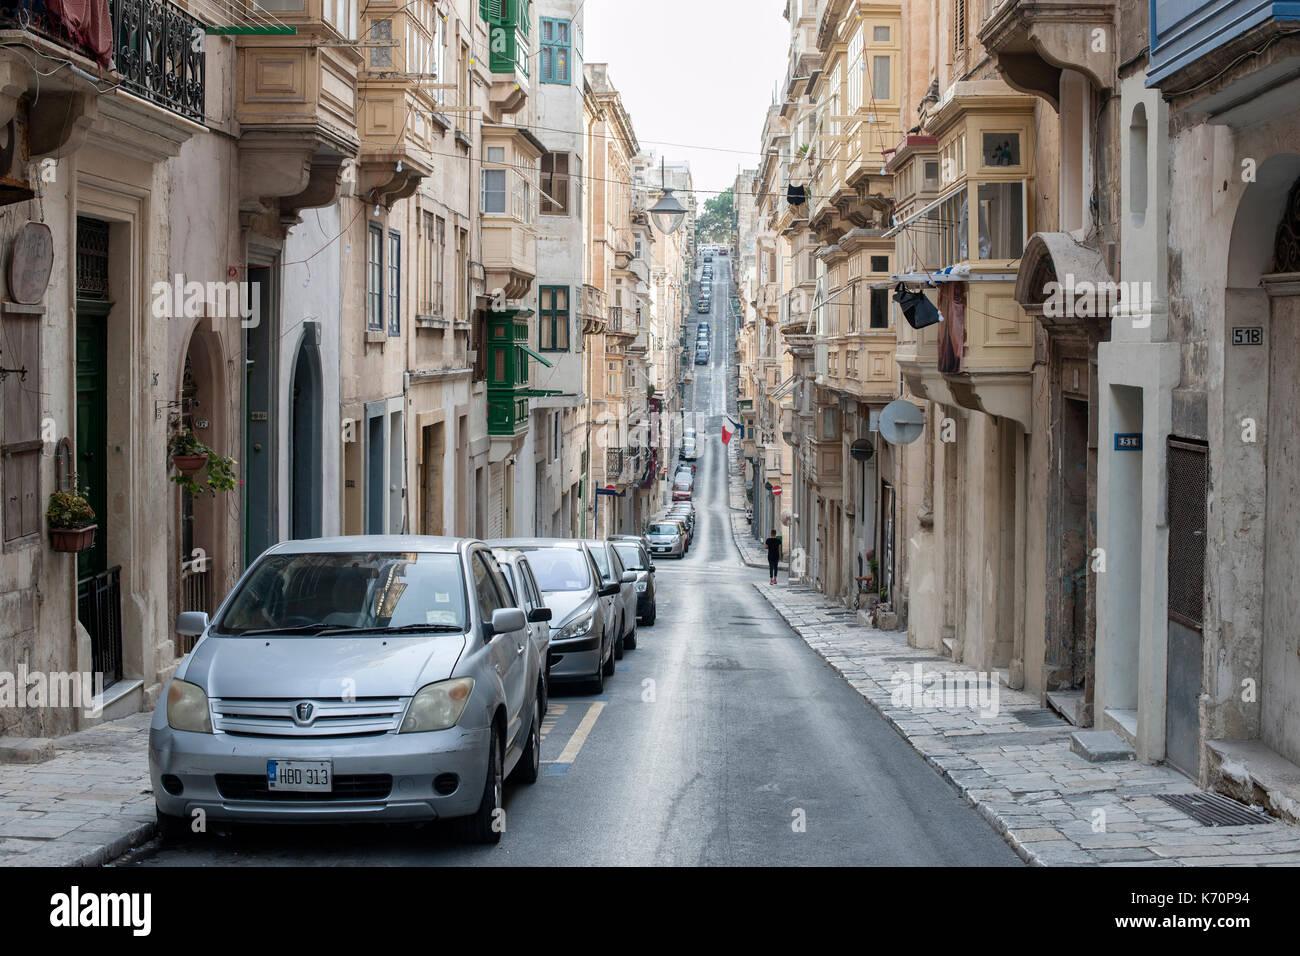 View up Zekka street (Triq Zekka) in Valletta, the capital of Malta. - Stock Image